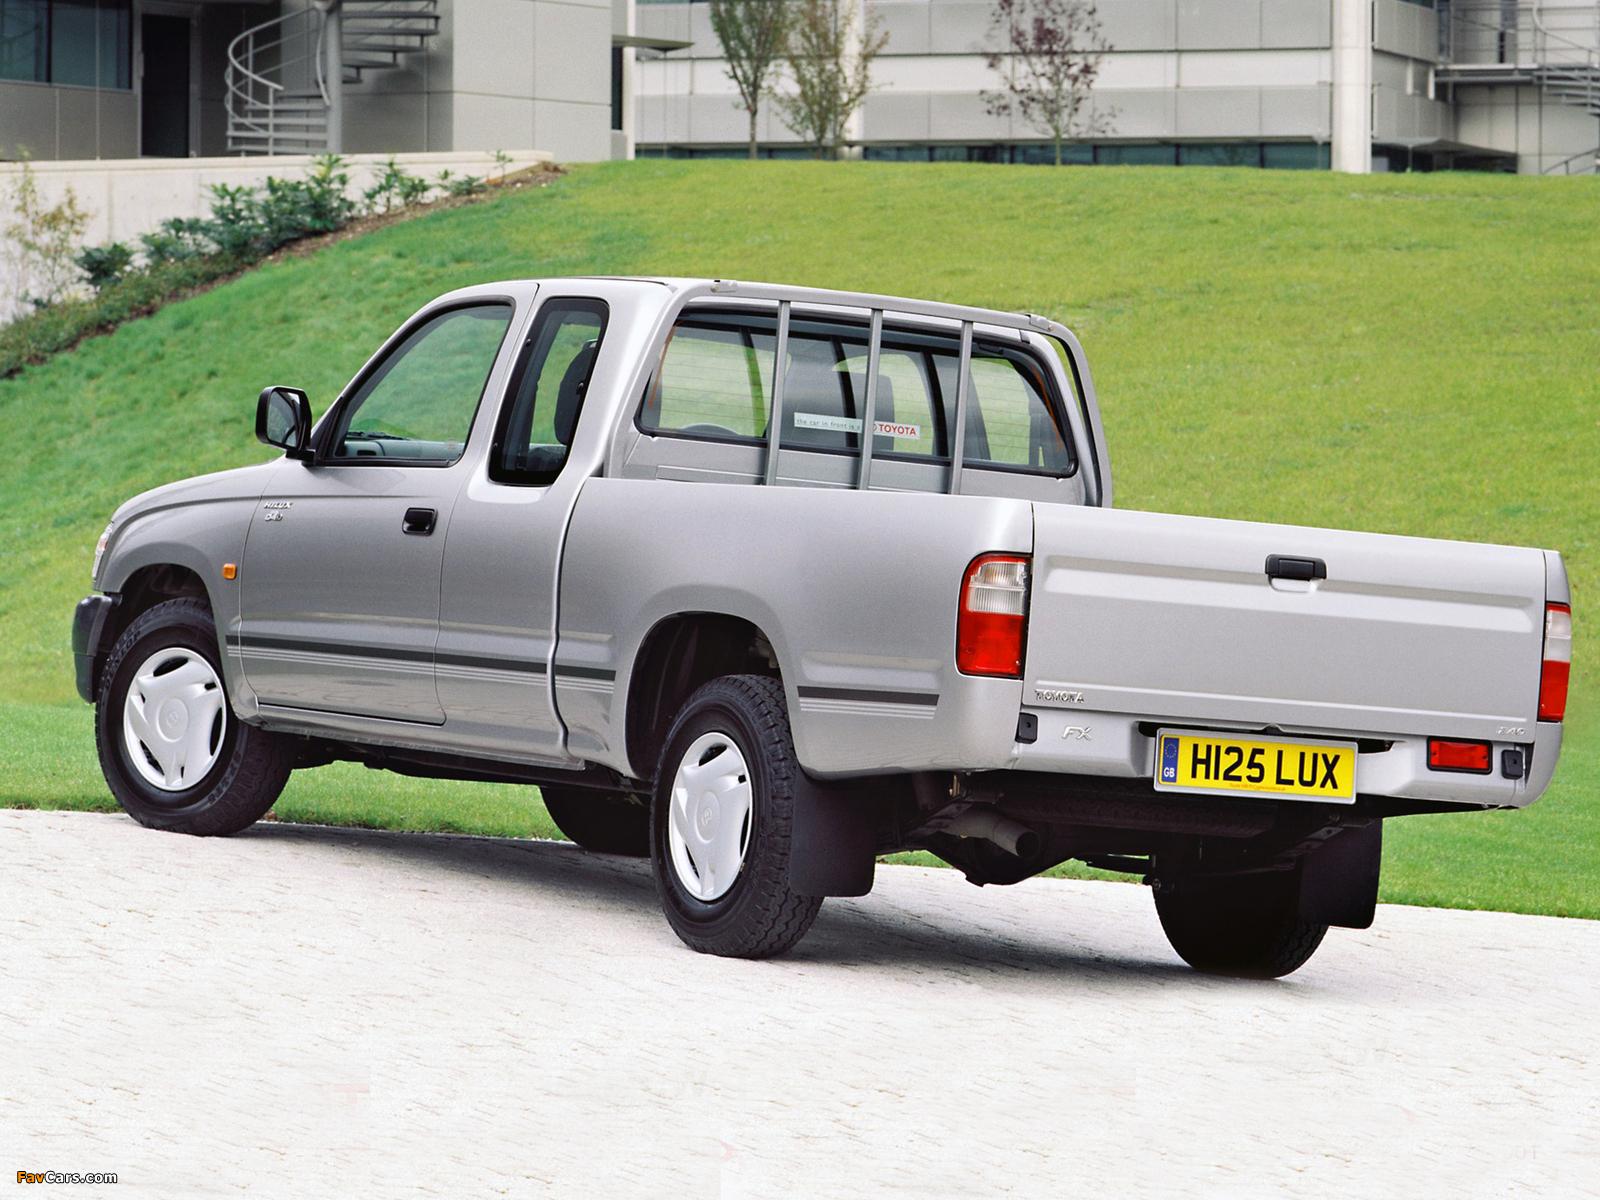 Toyota Hilux Surf (Тойота Хайлюкс сурф) - Продажа, Цены ...